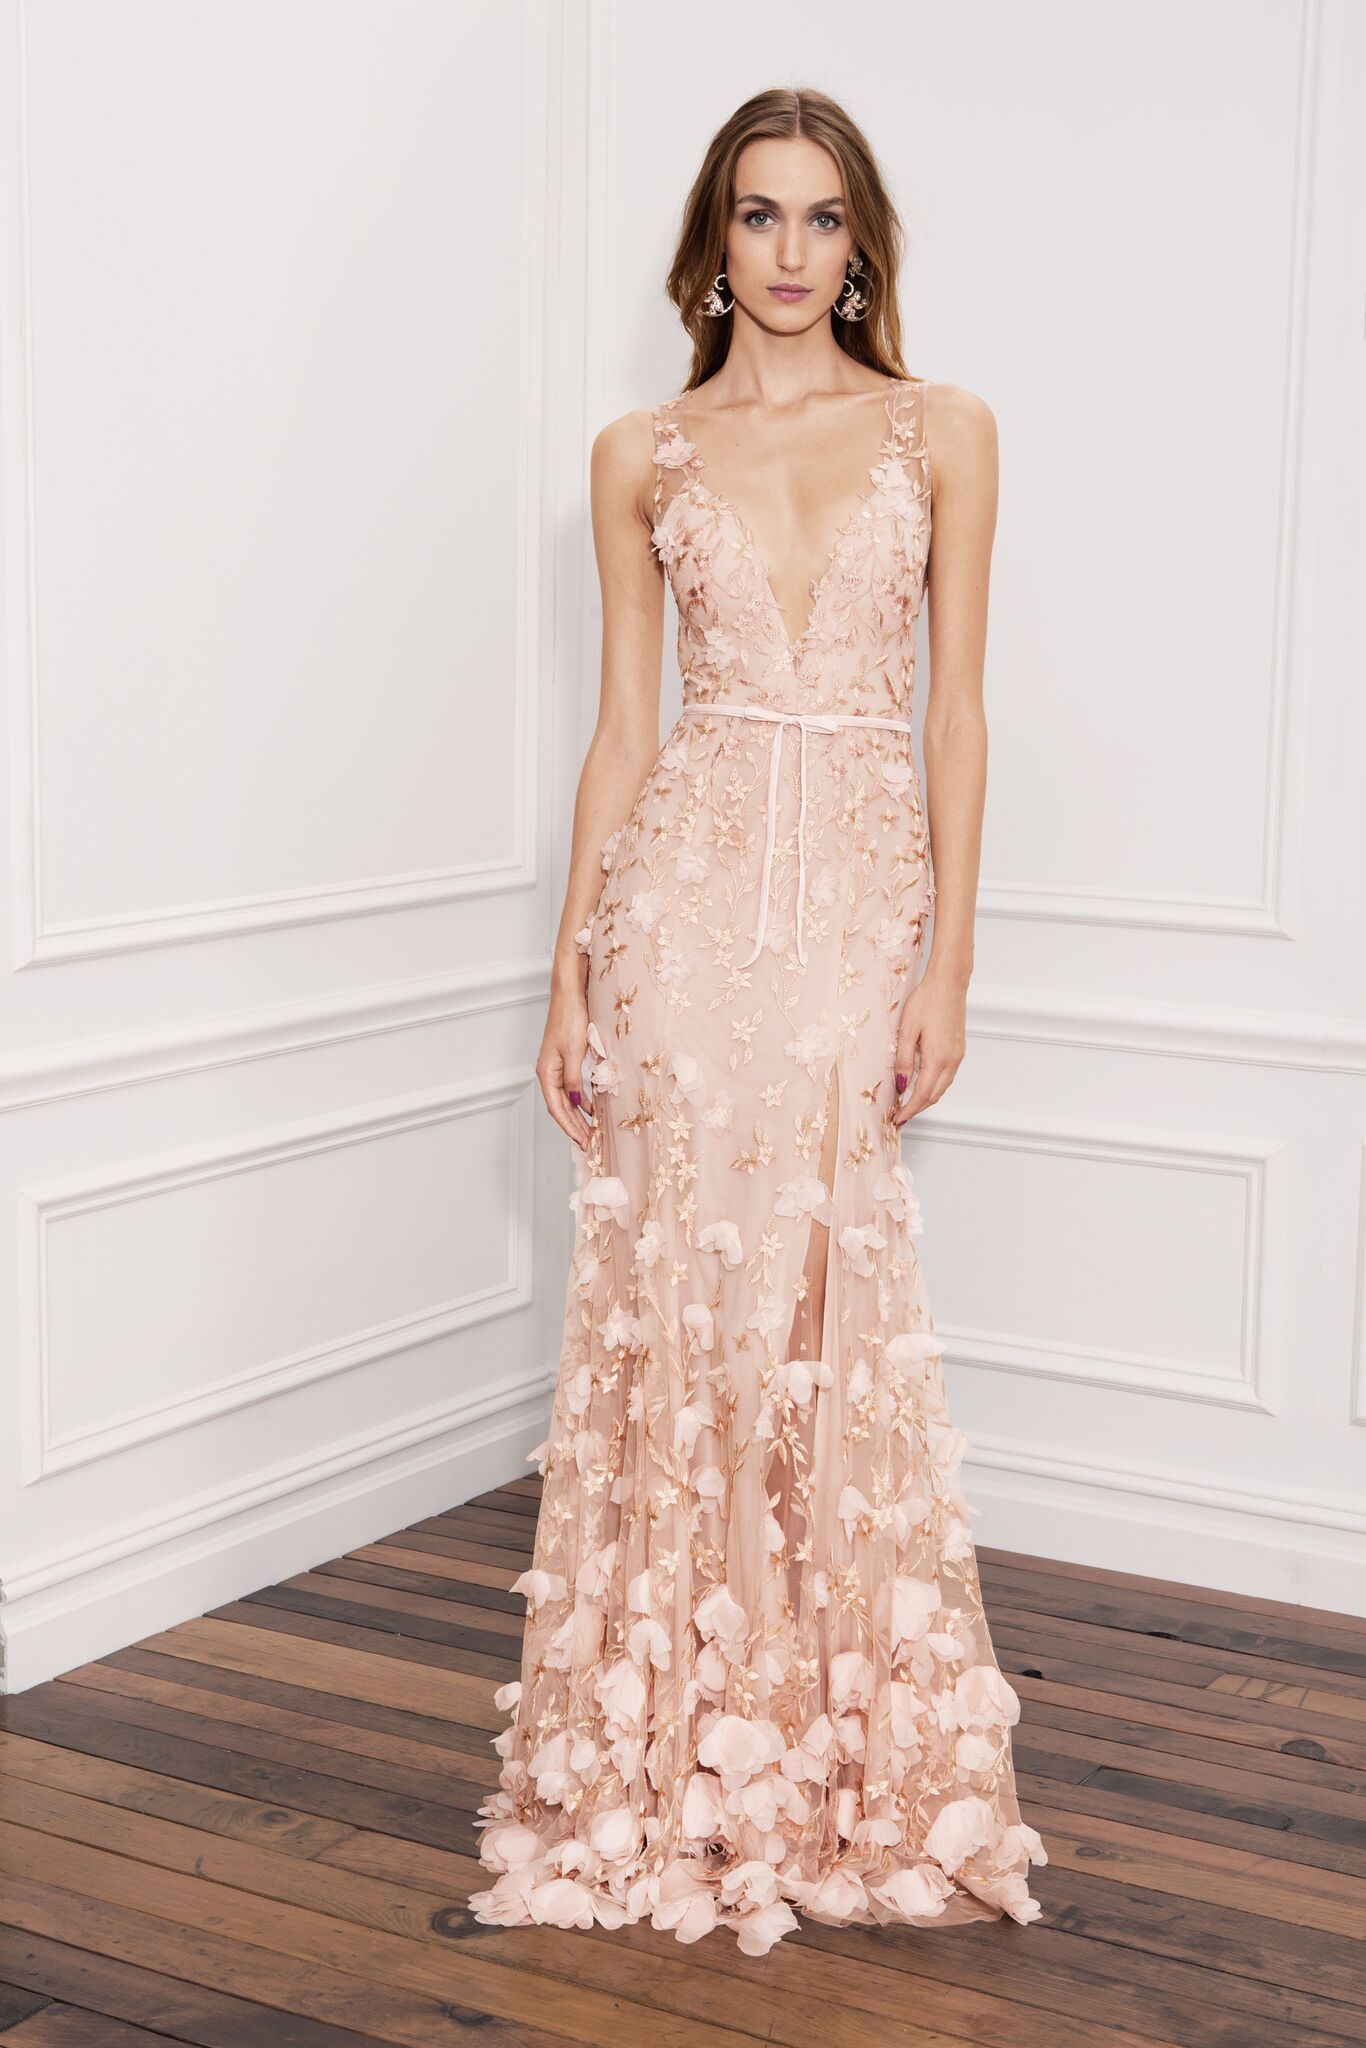 406280e5 Marchesa Notte flower appliqué gown | Marchesa Spring 2018 in 2019 ...